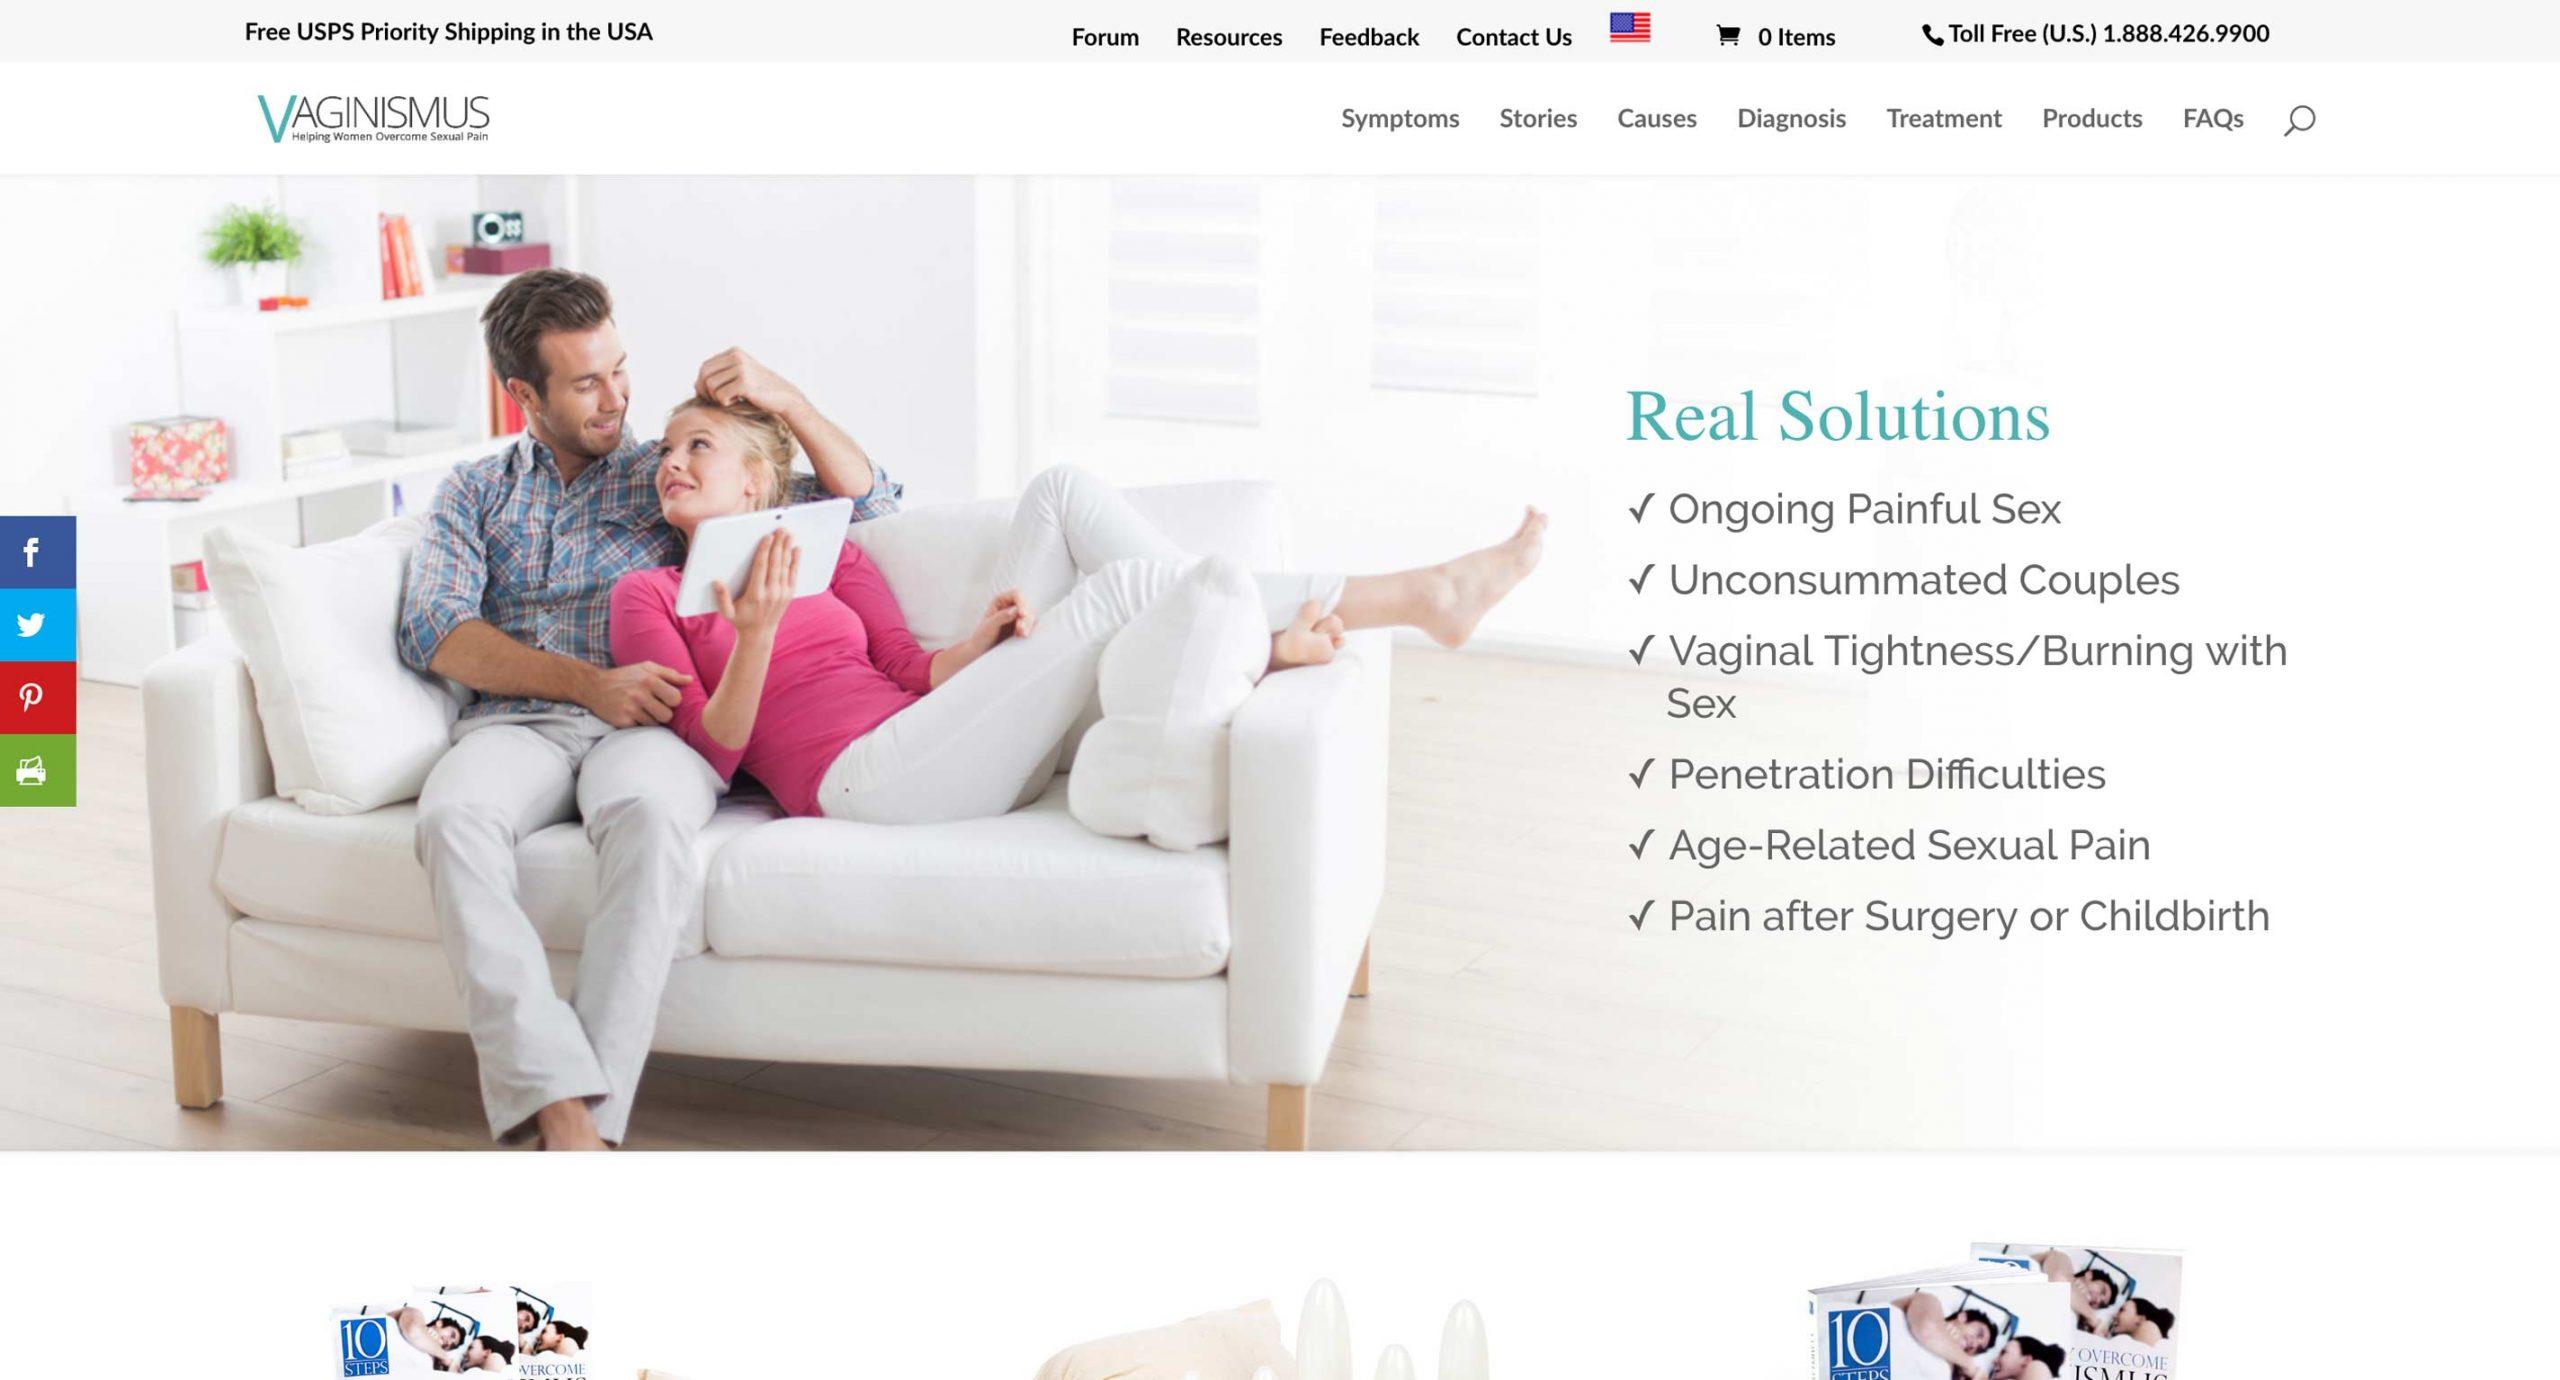 Vaginismus.com - Home Page